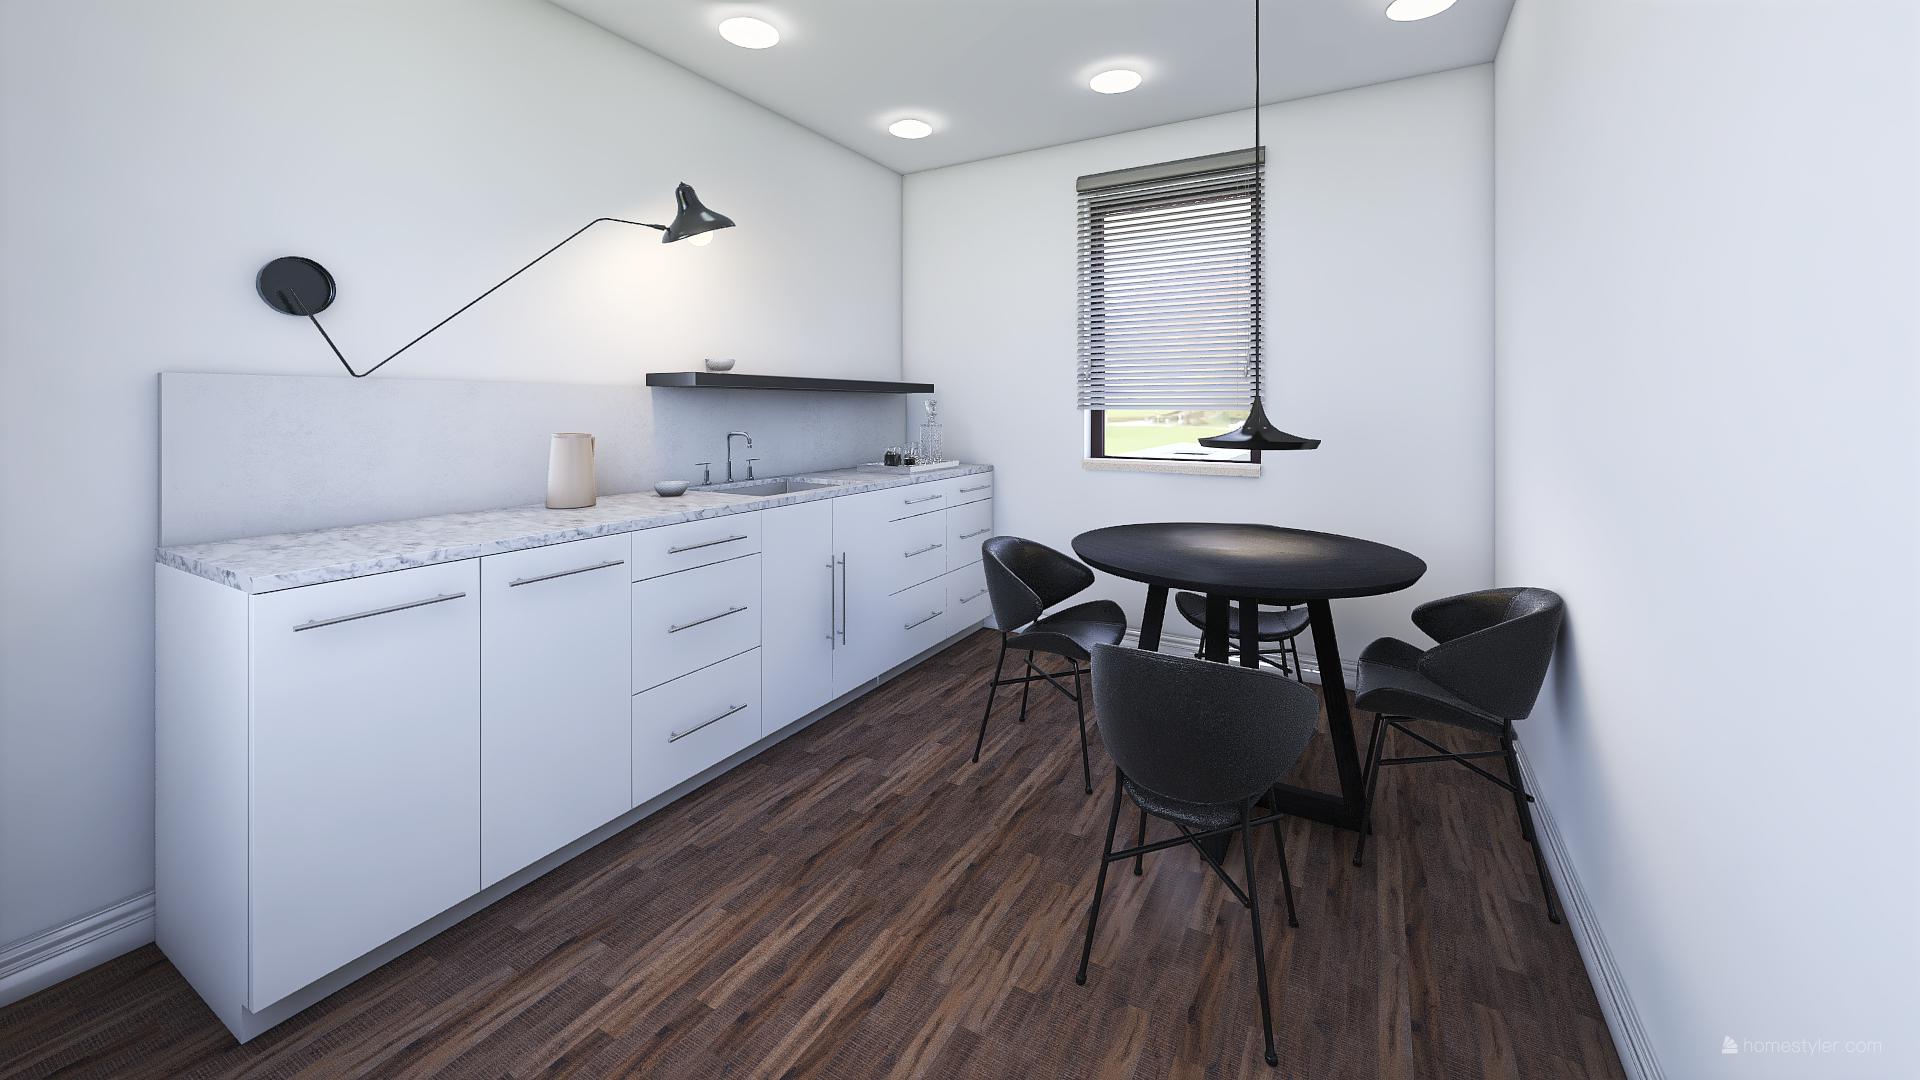 Kuchnia Bez Szafek Gornych Home Decor Home Kitchen